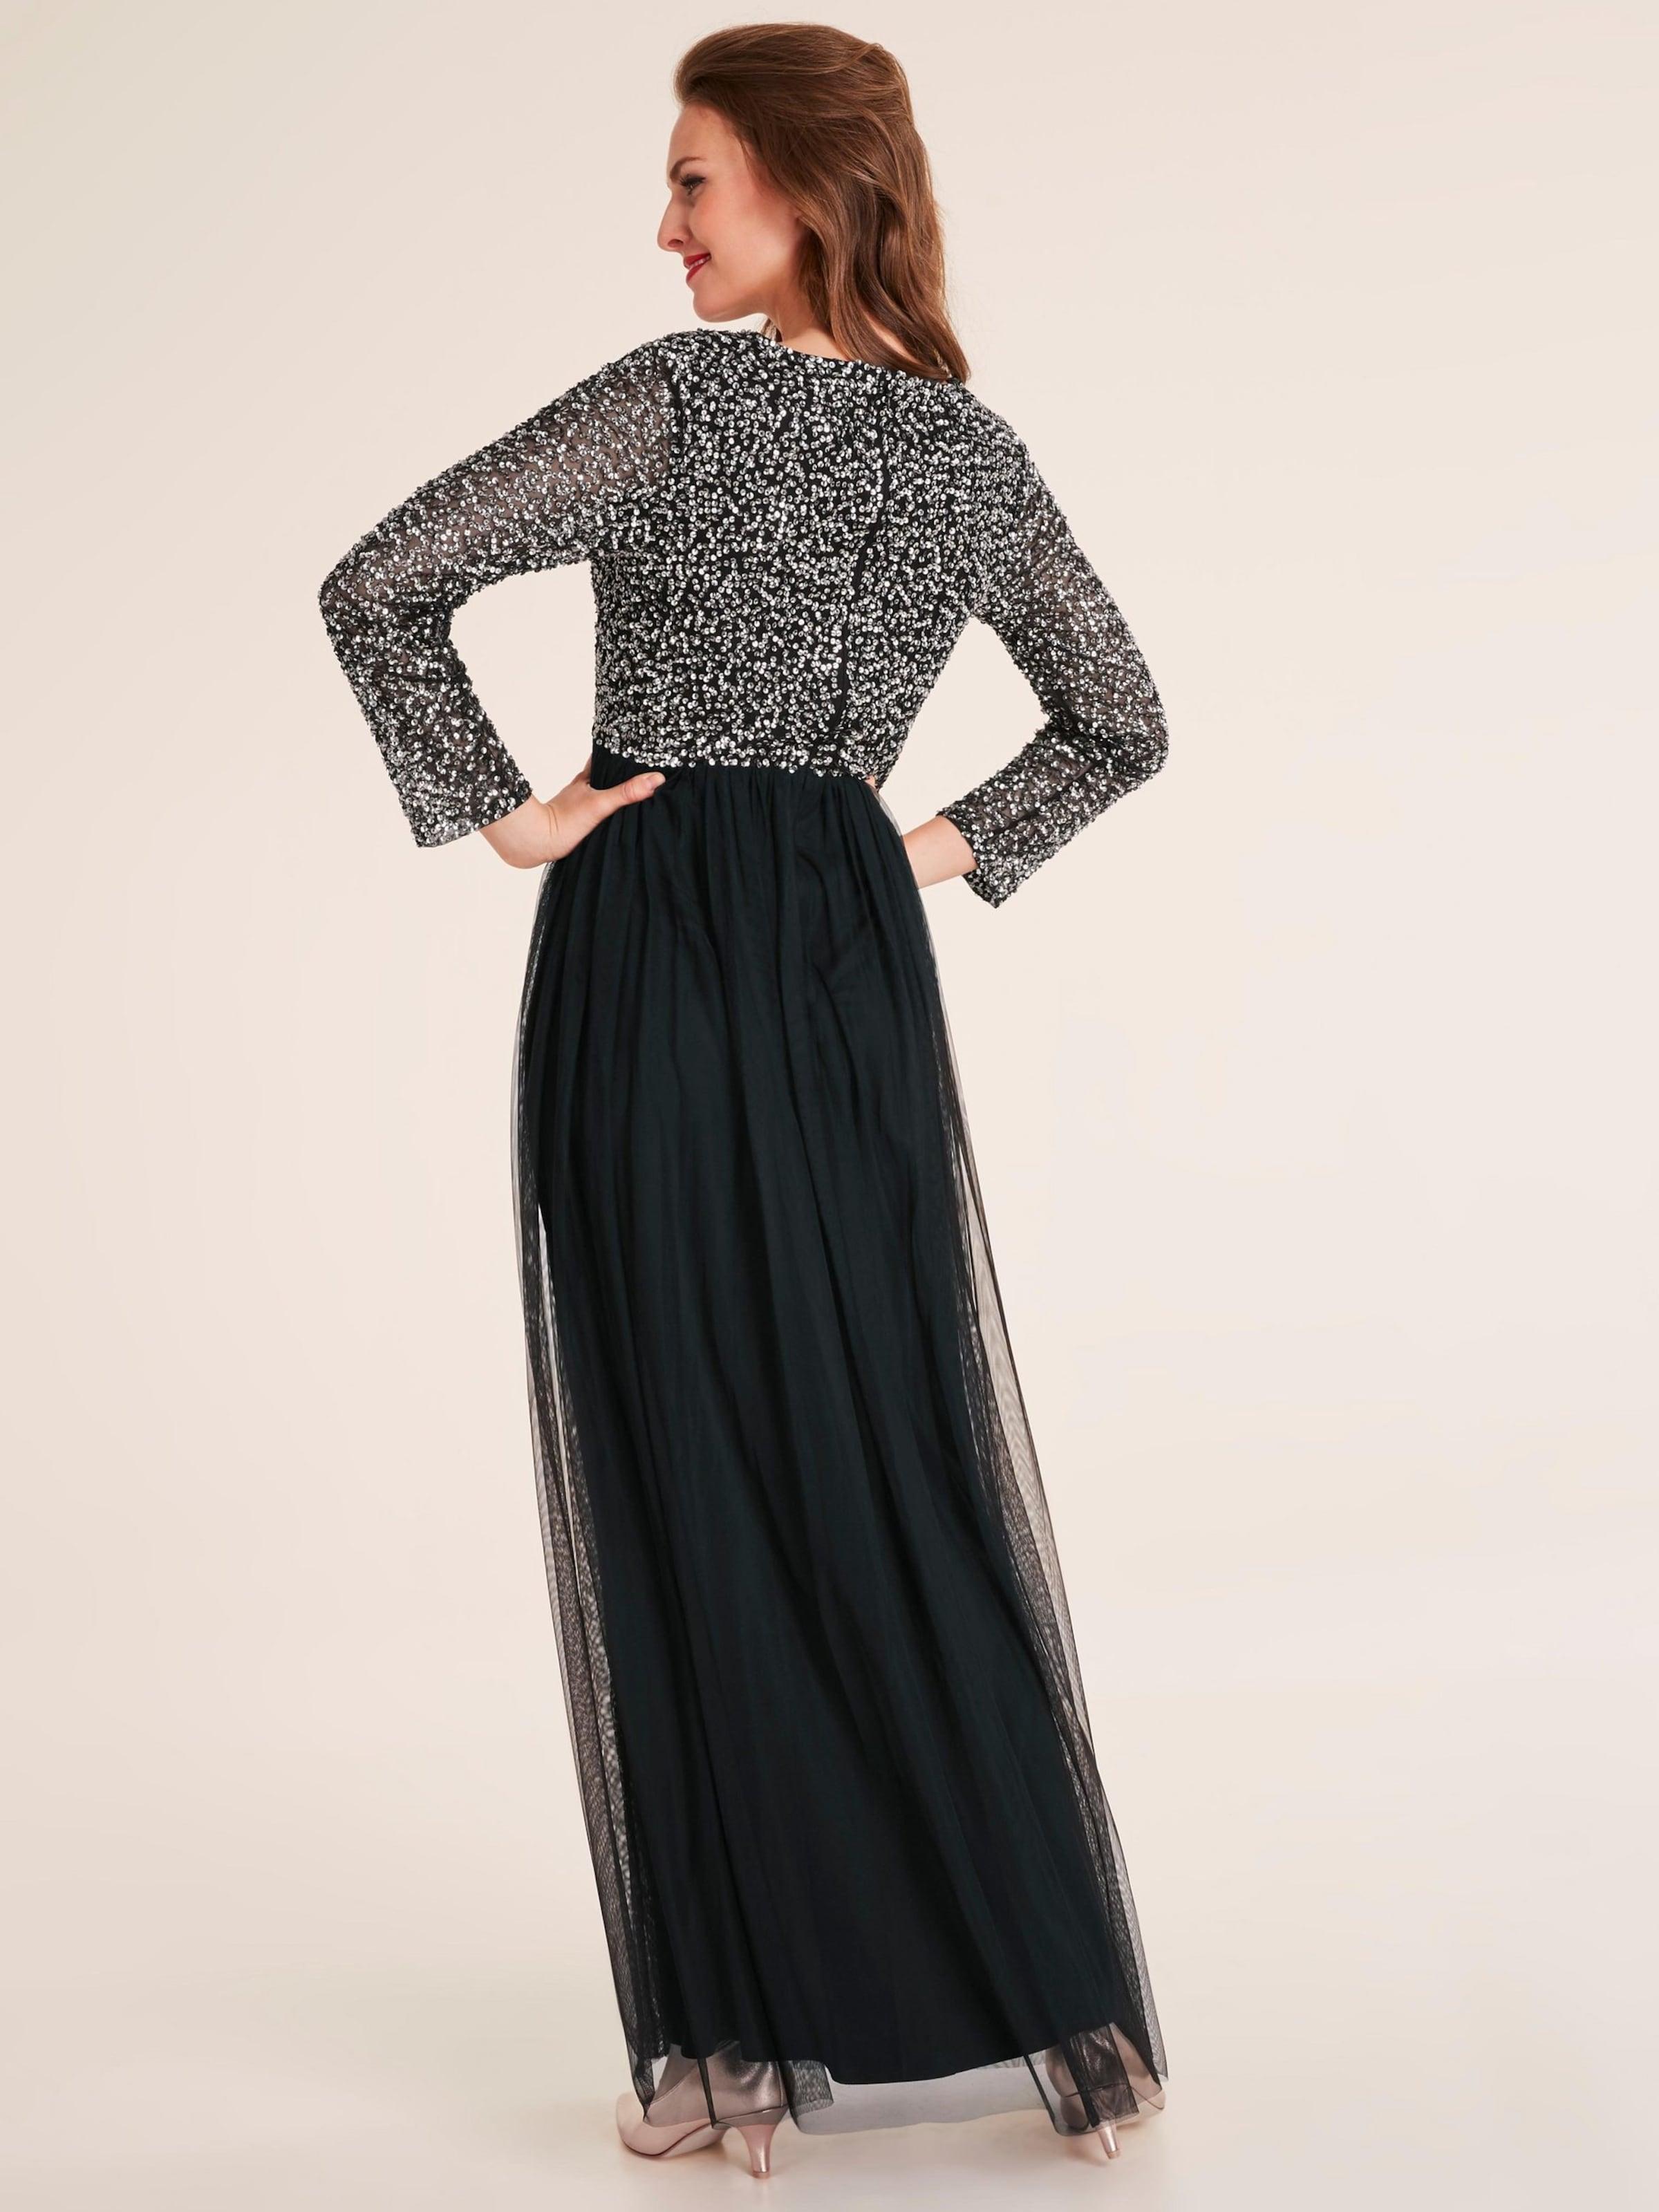 Soirée Robe En Heine De NoirArgent bv6gfYI7y